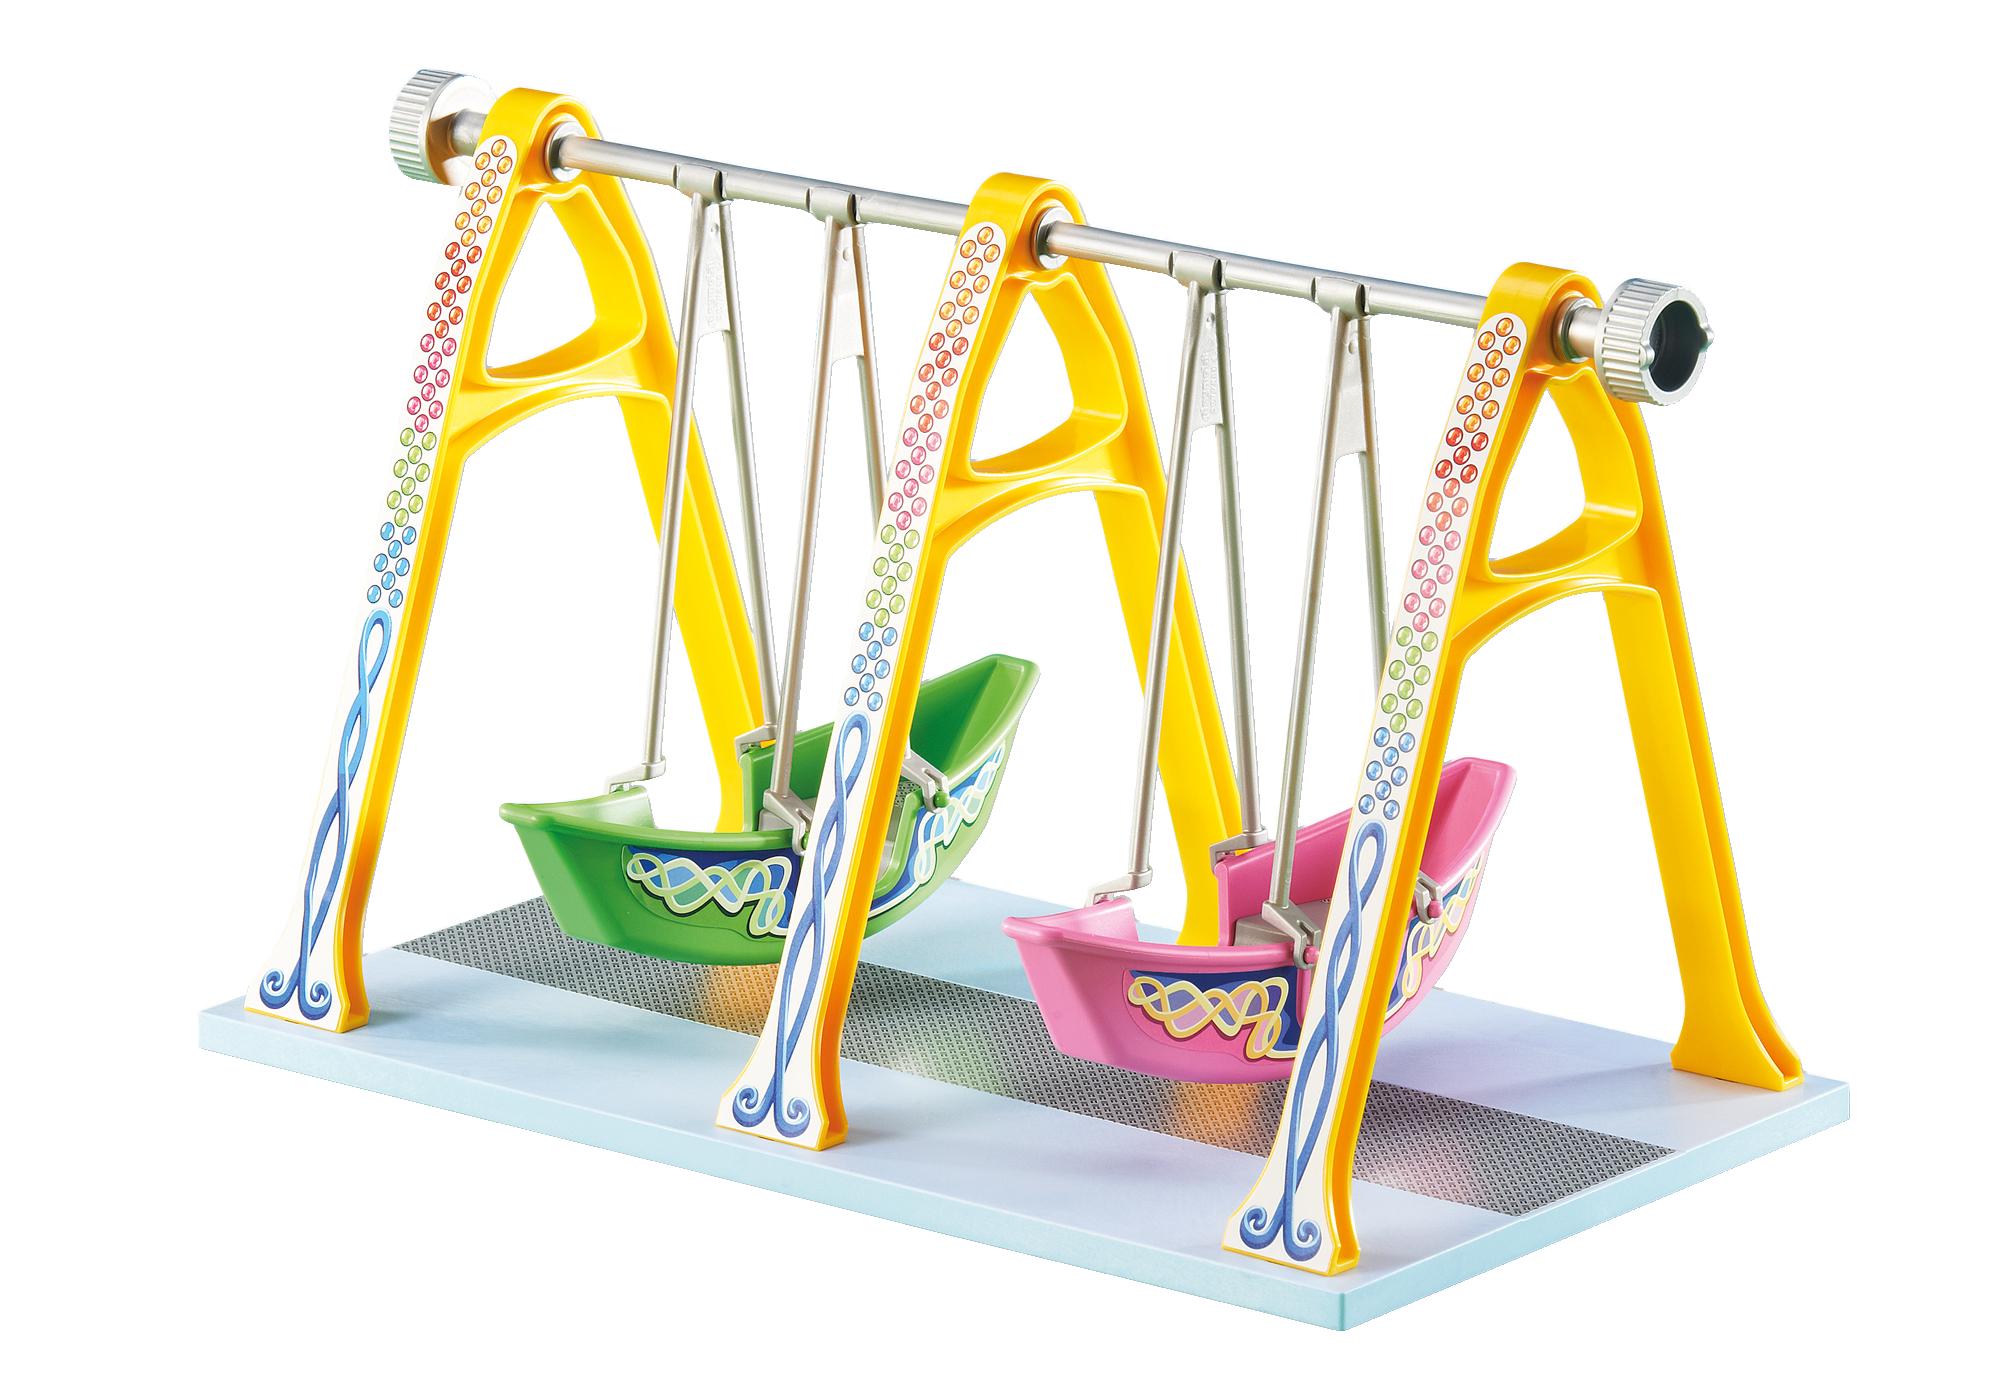 http://media.playmobil.com/i/playmobil/6517_product_detail/Schiffschaukel